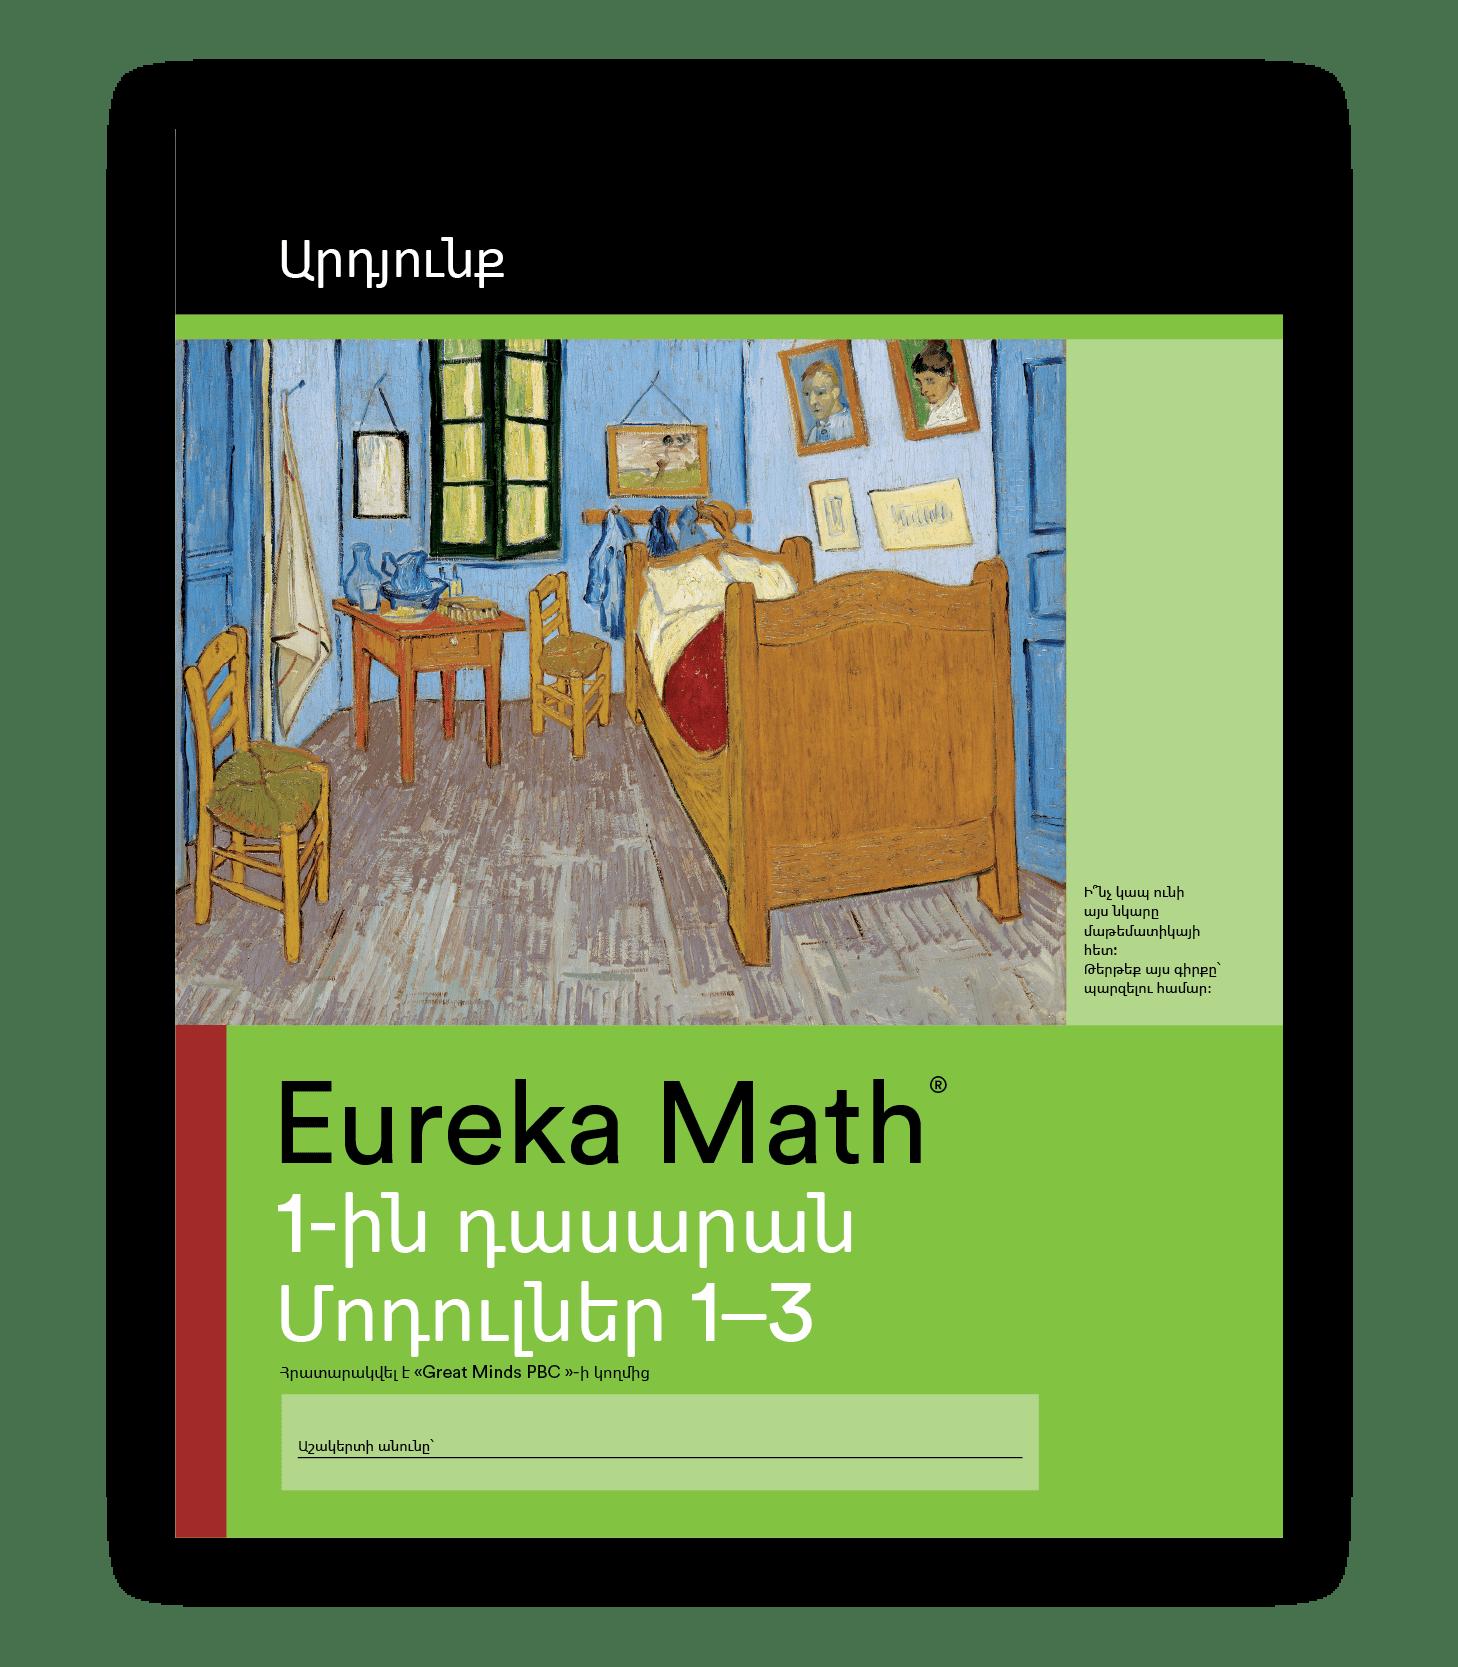 Eureka Math Succeed Book in Armenian for Grade 1